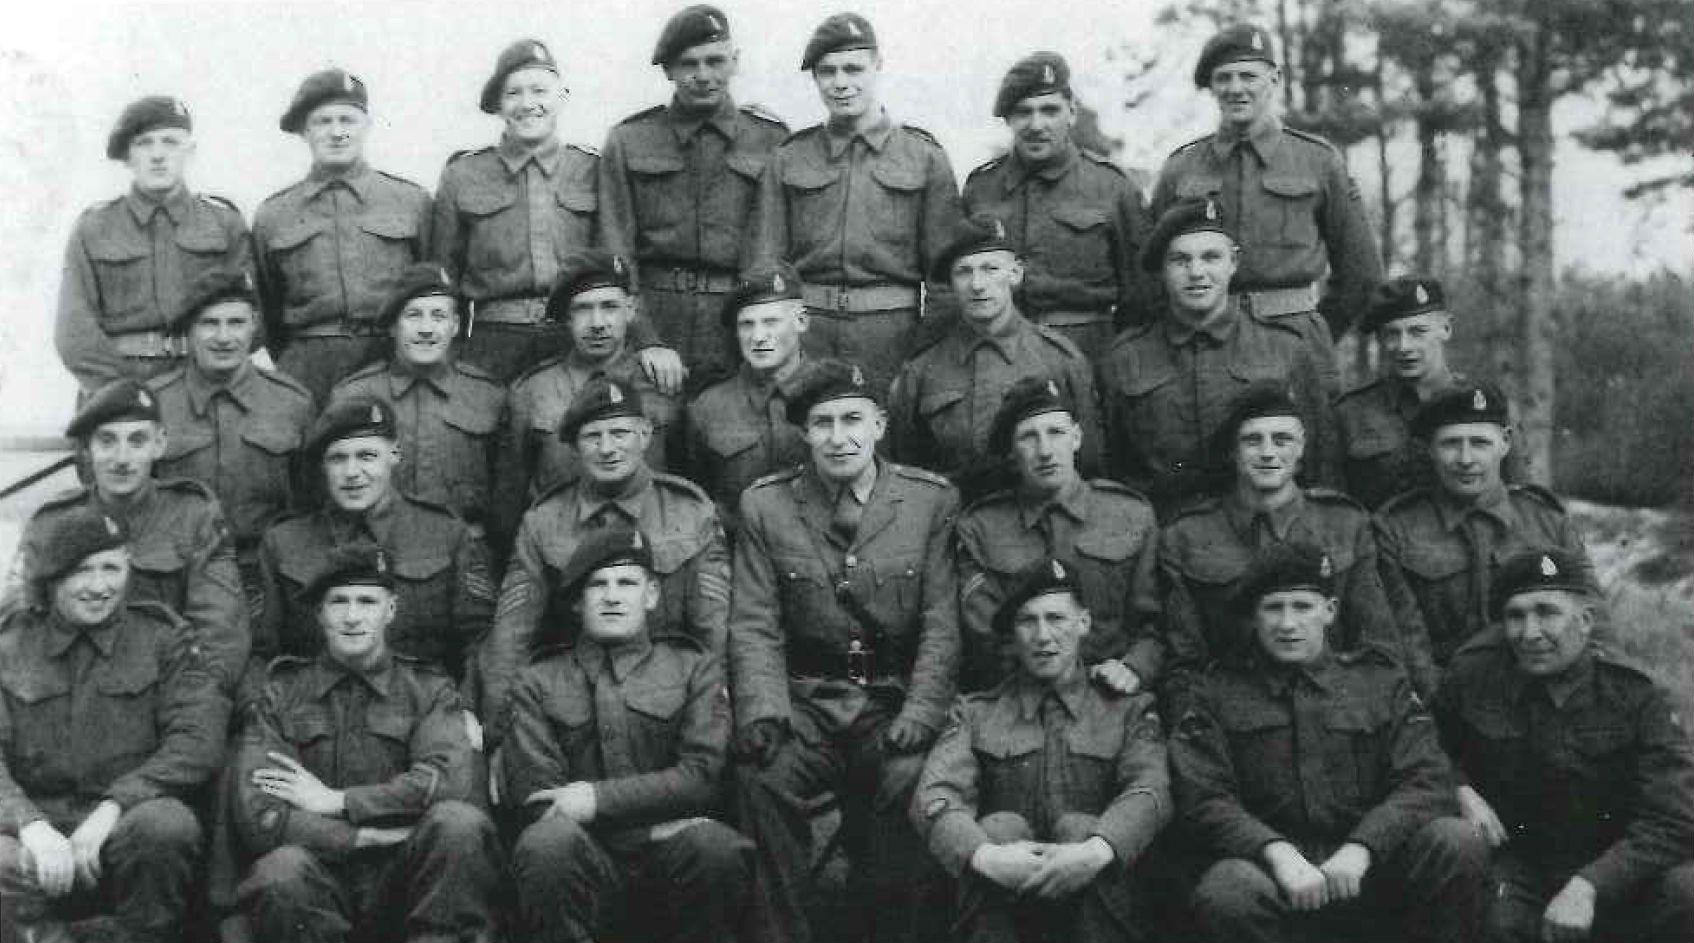 Einsatzgruppen SS insignia. - Axis History Forum